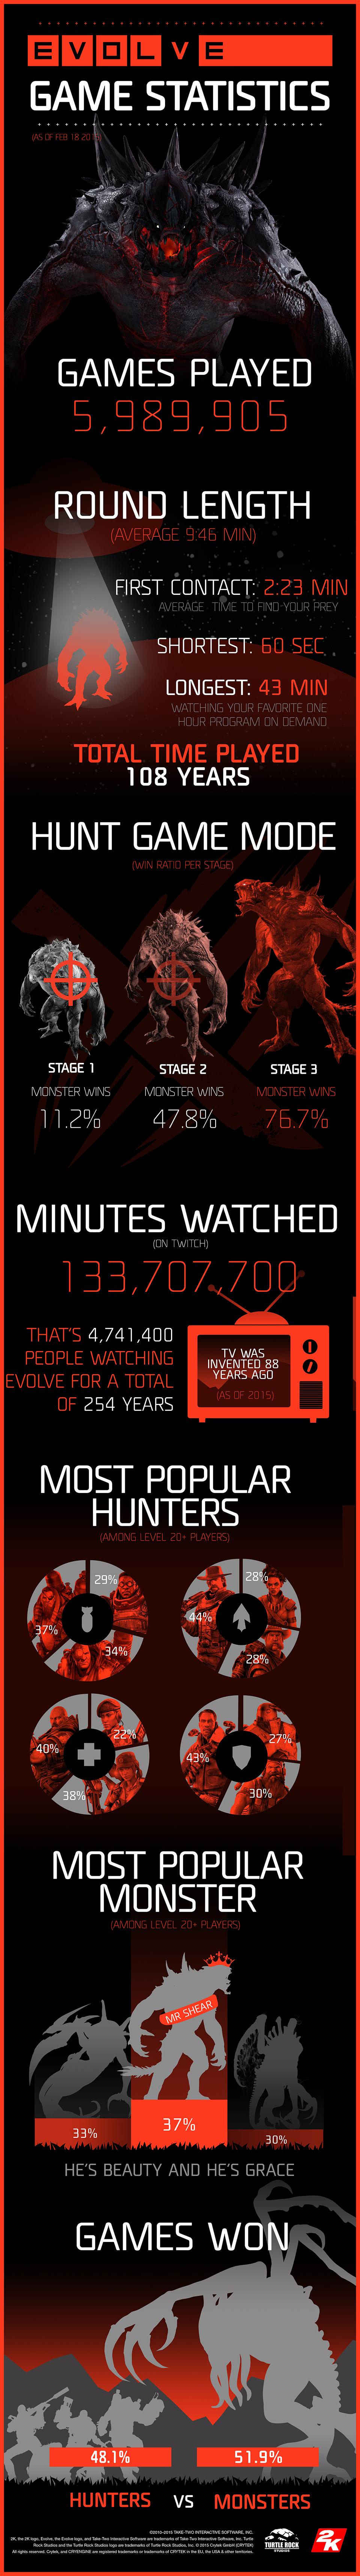 2k_evolve_launch_infographic